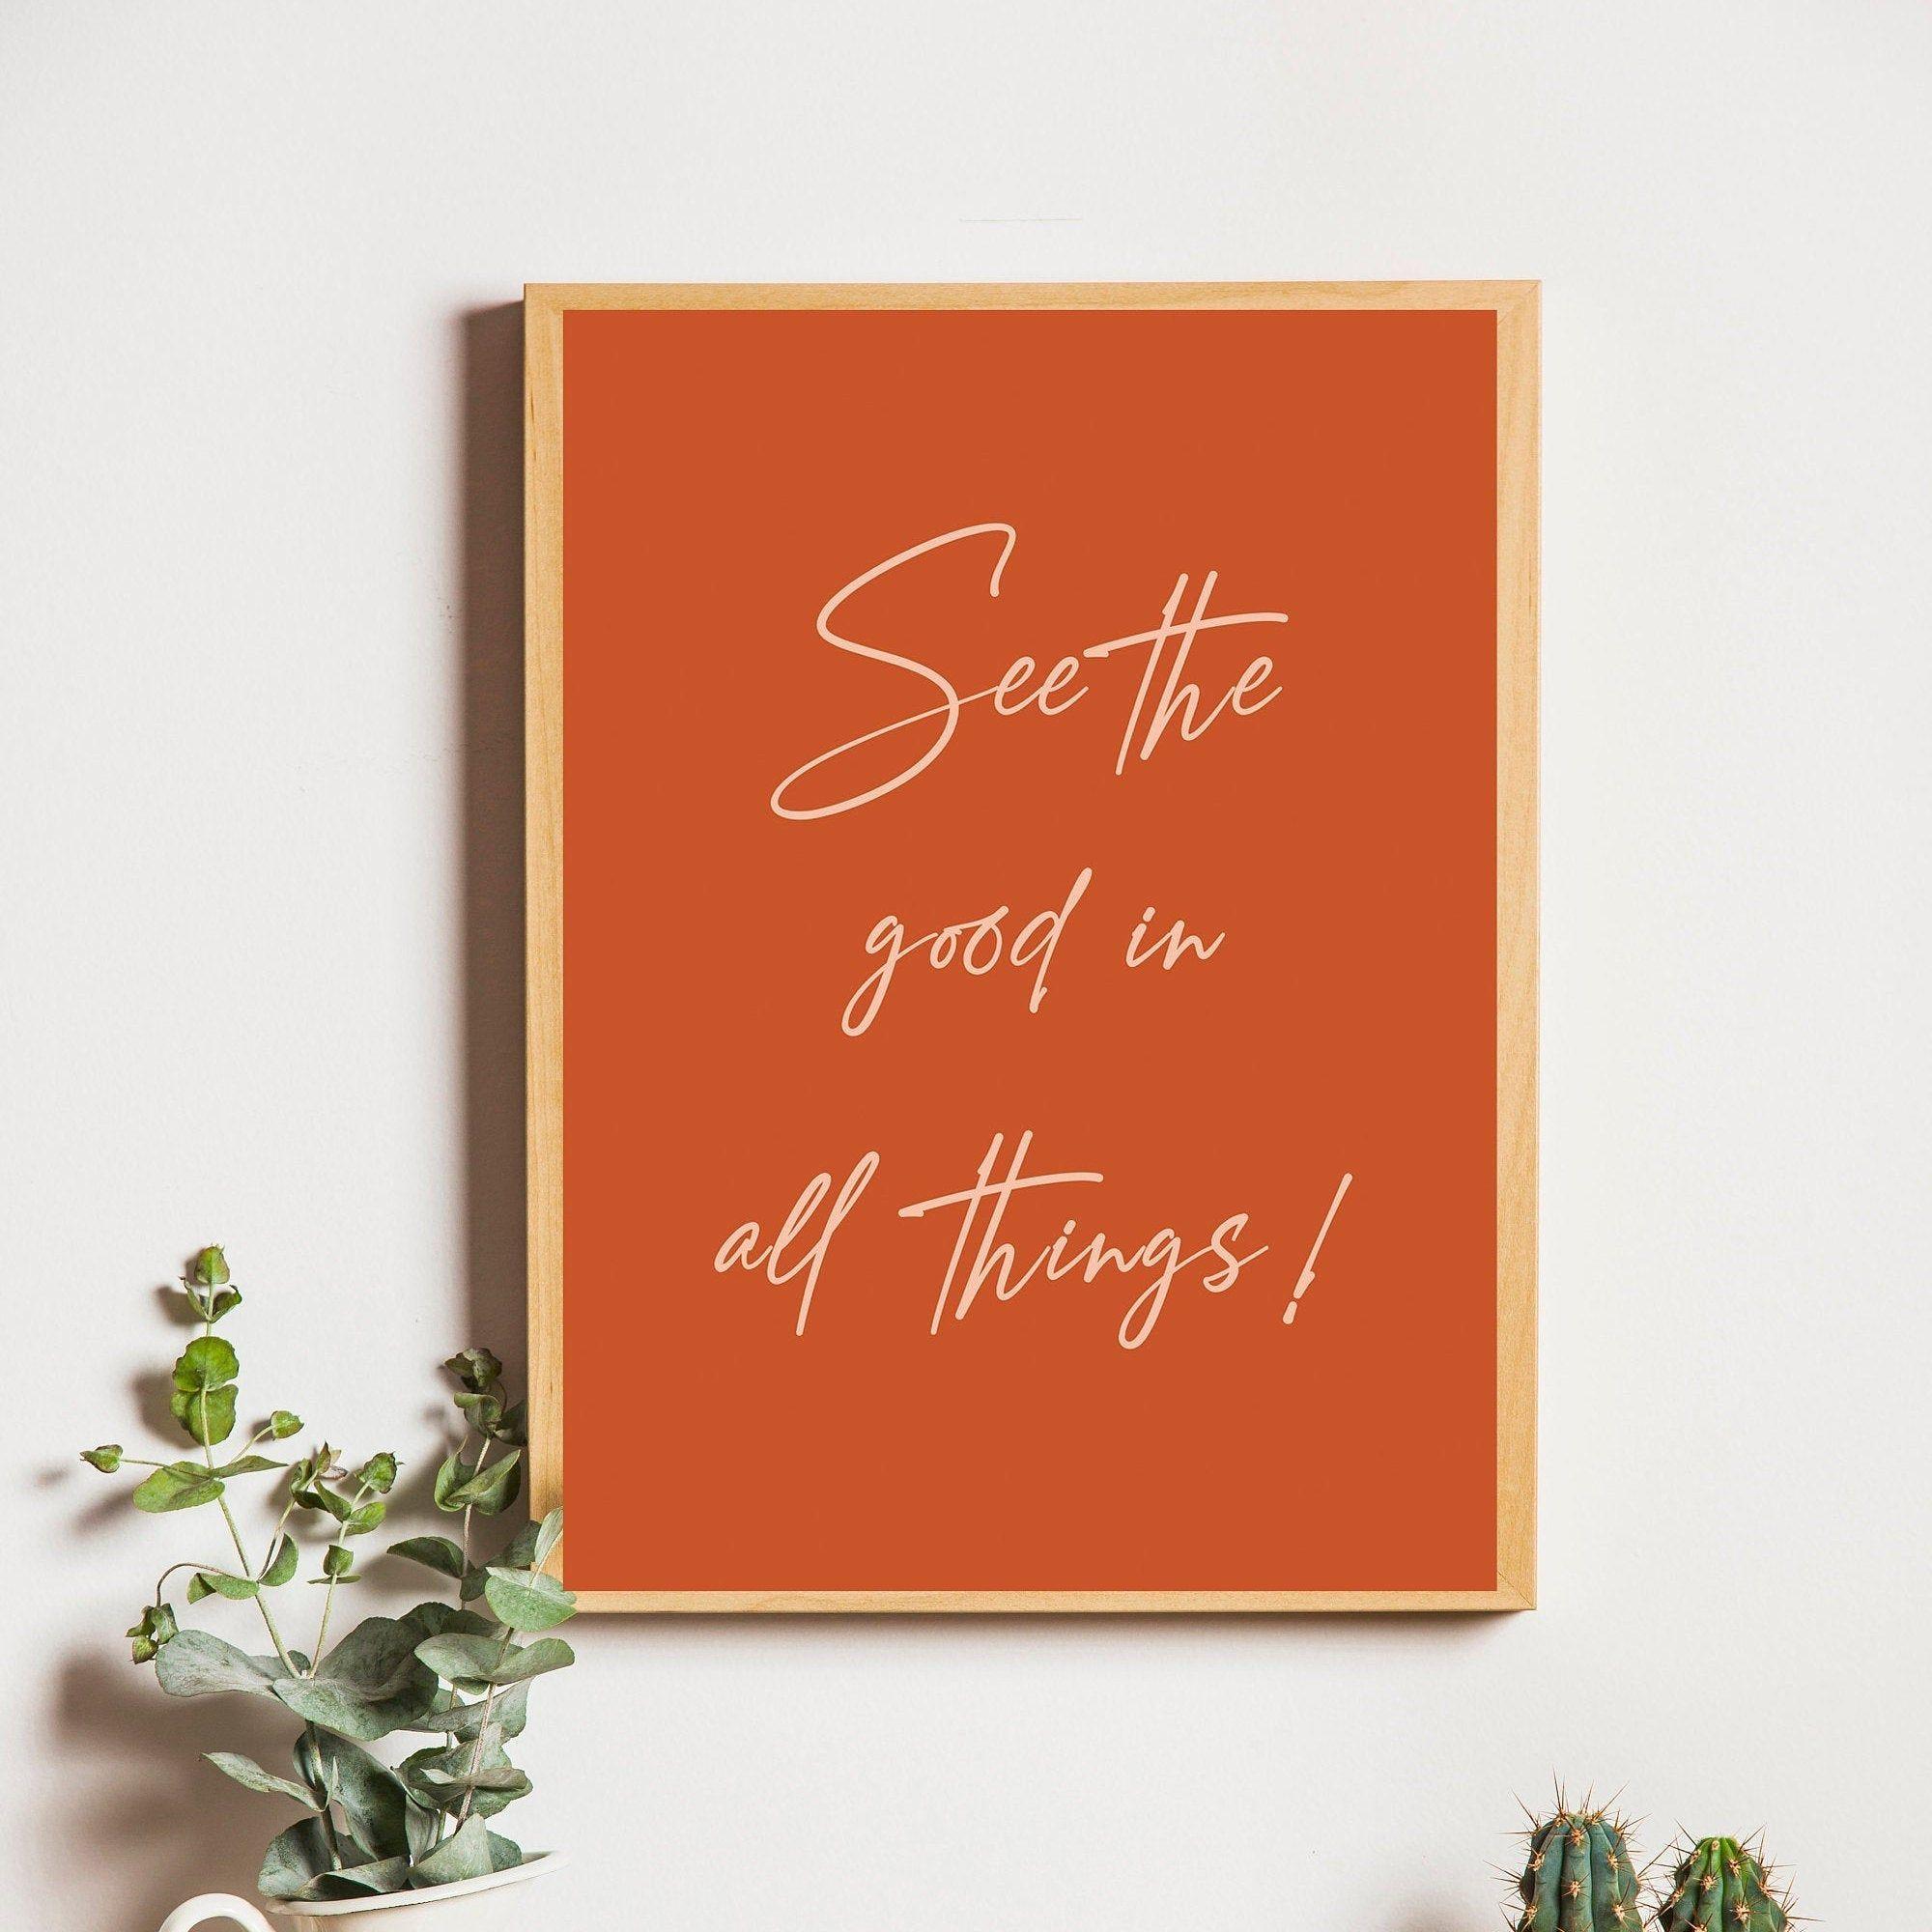 See The Good Quote Printminimalist Poster Burnt Orange Wall Etsy In 2020 Orange Wall Art Orange Walls Orange Aesthetic